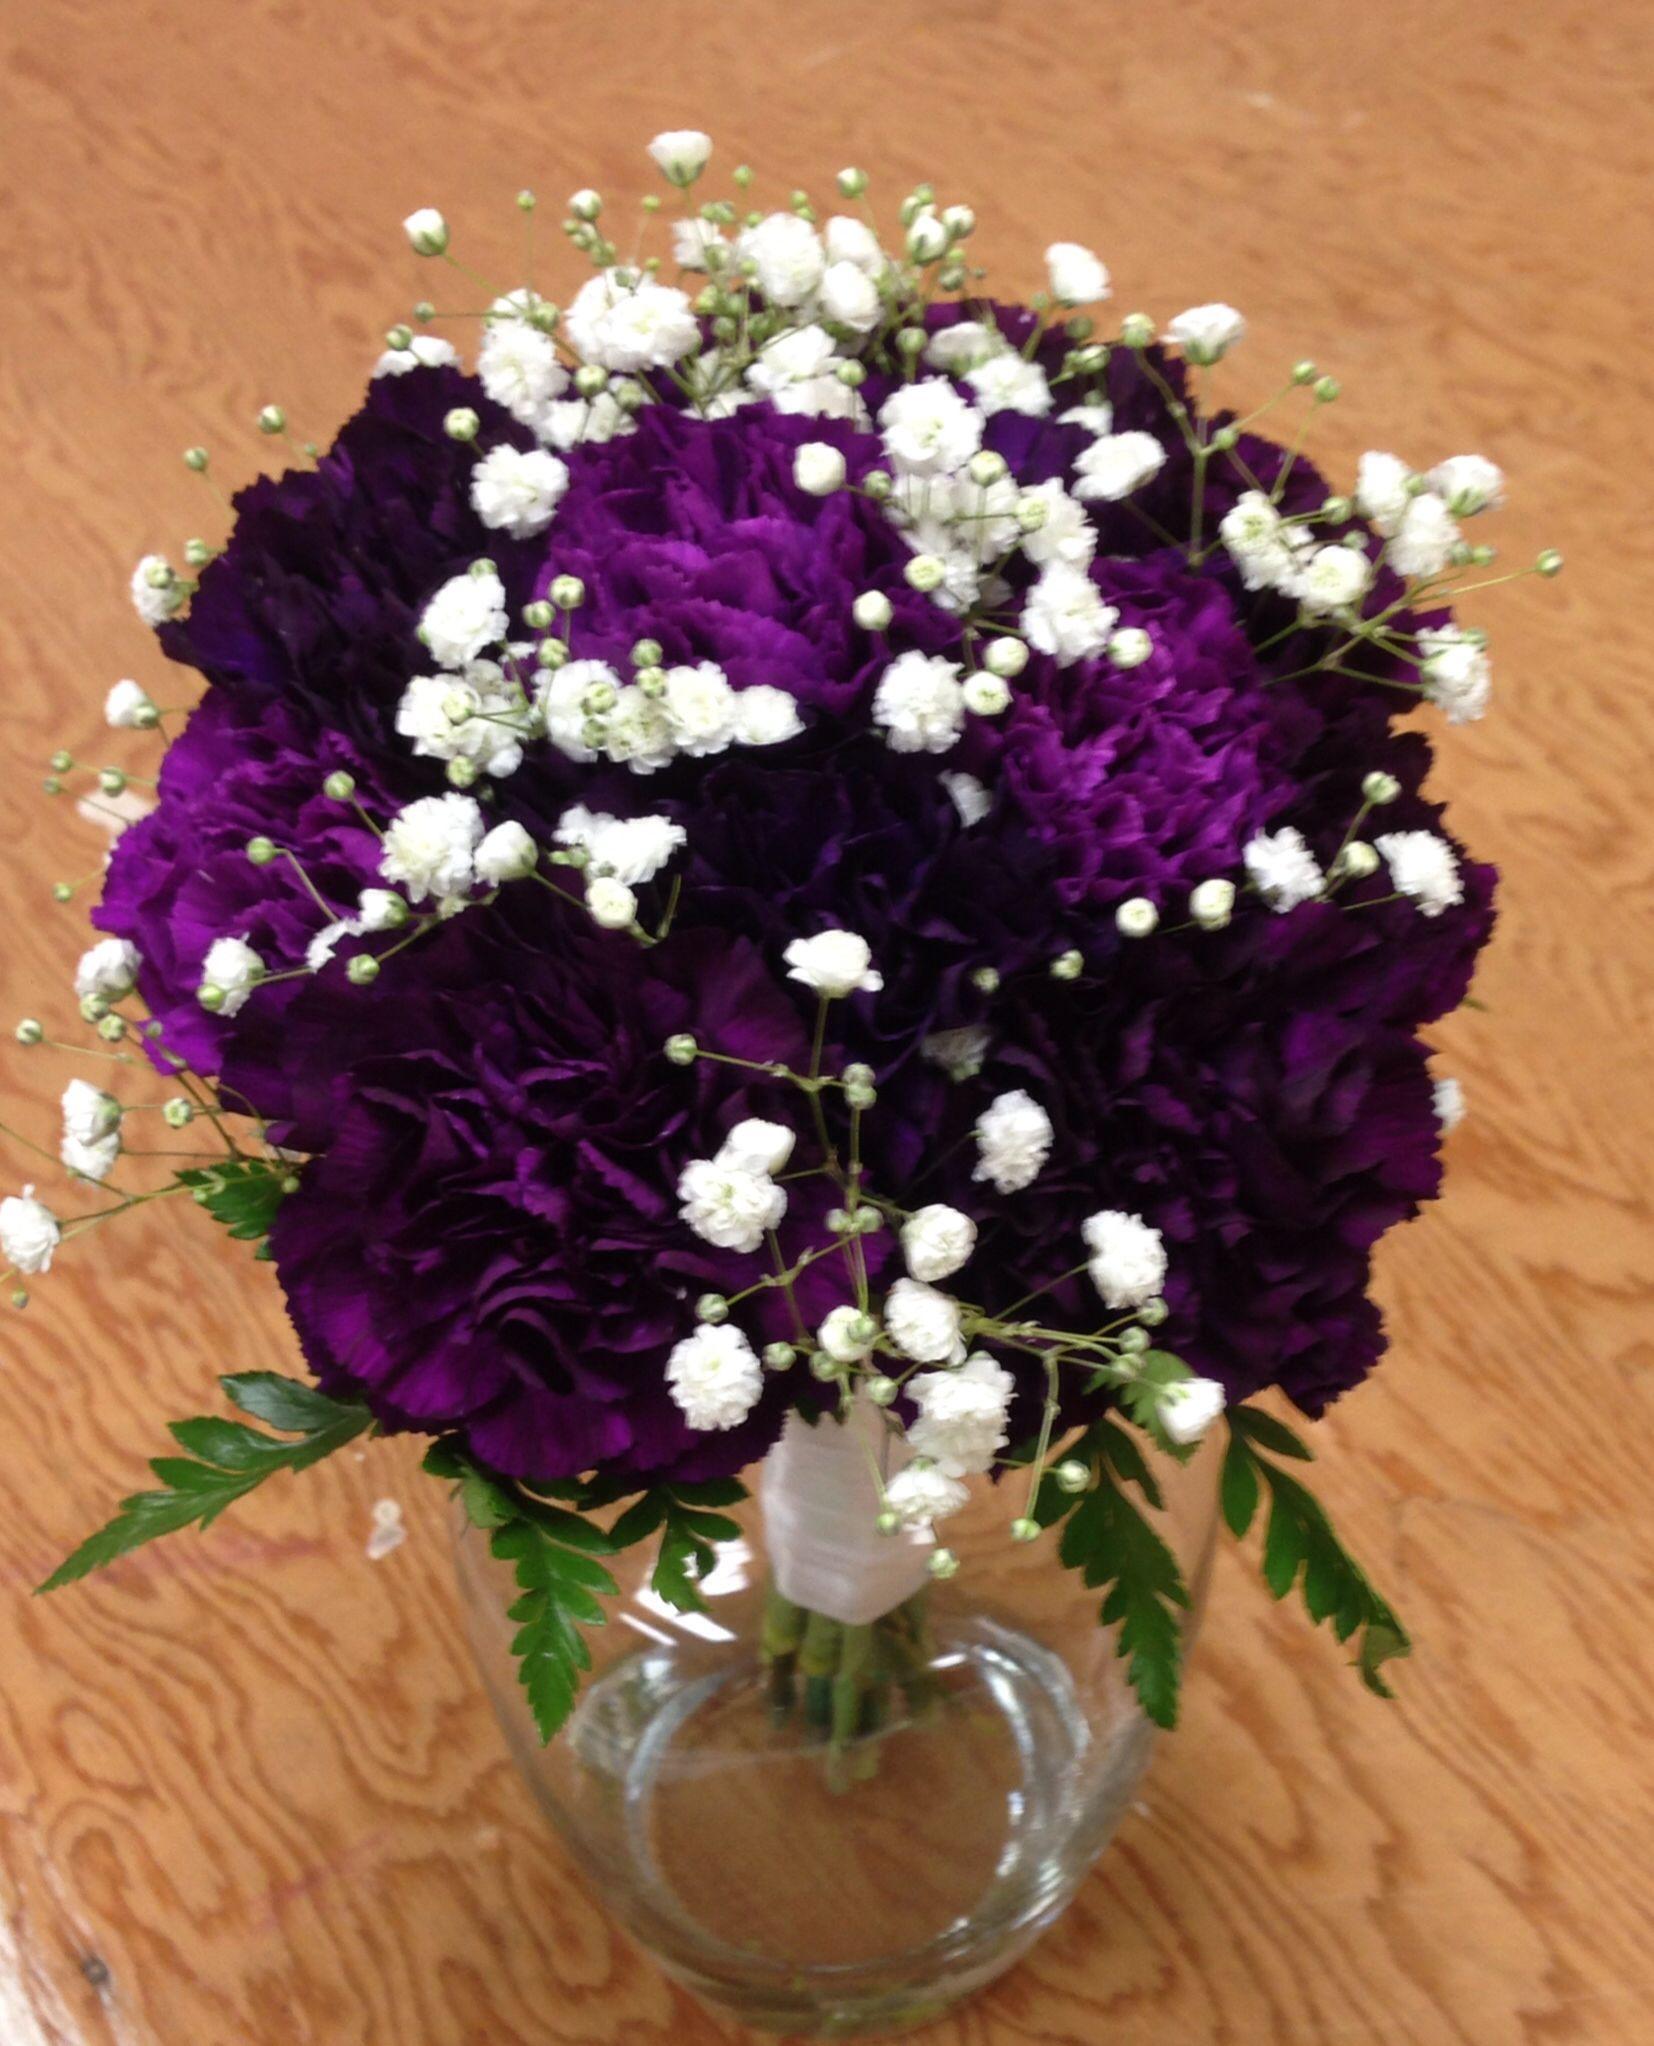 Simple Flower Bouquets For Weddings: Bouquet, Purple Carnations, Babies Breath, White Ribbon